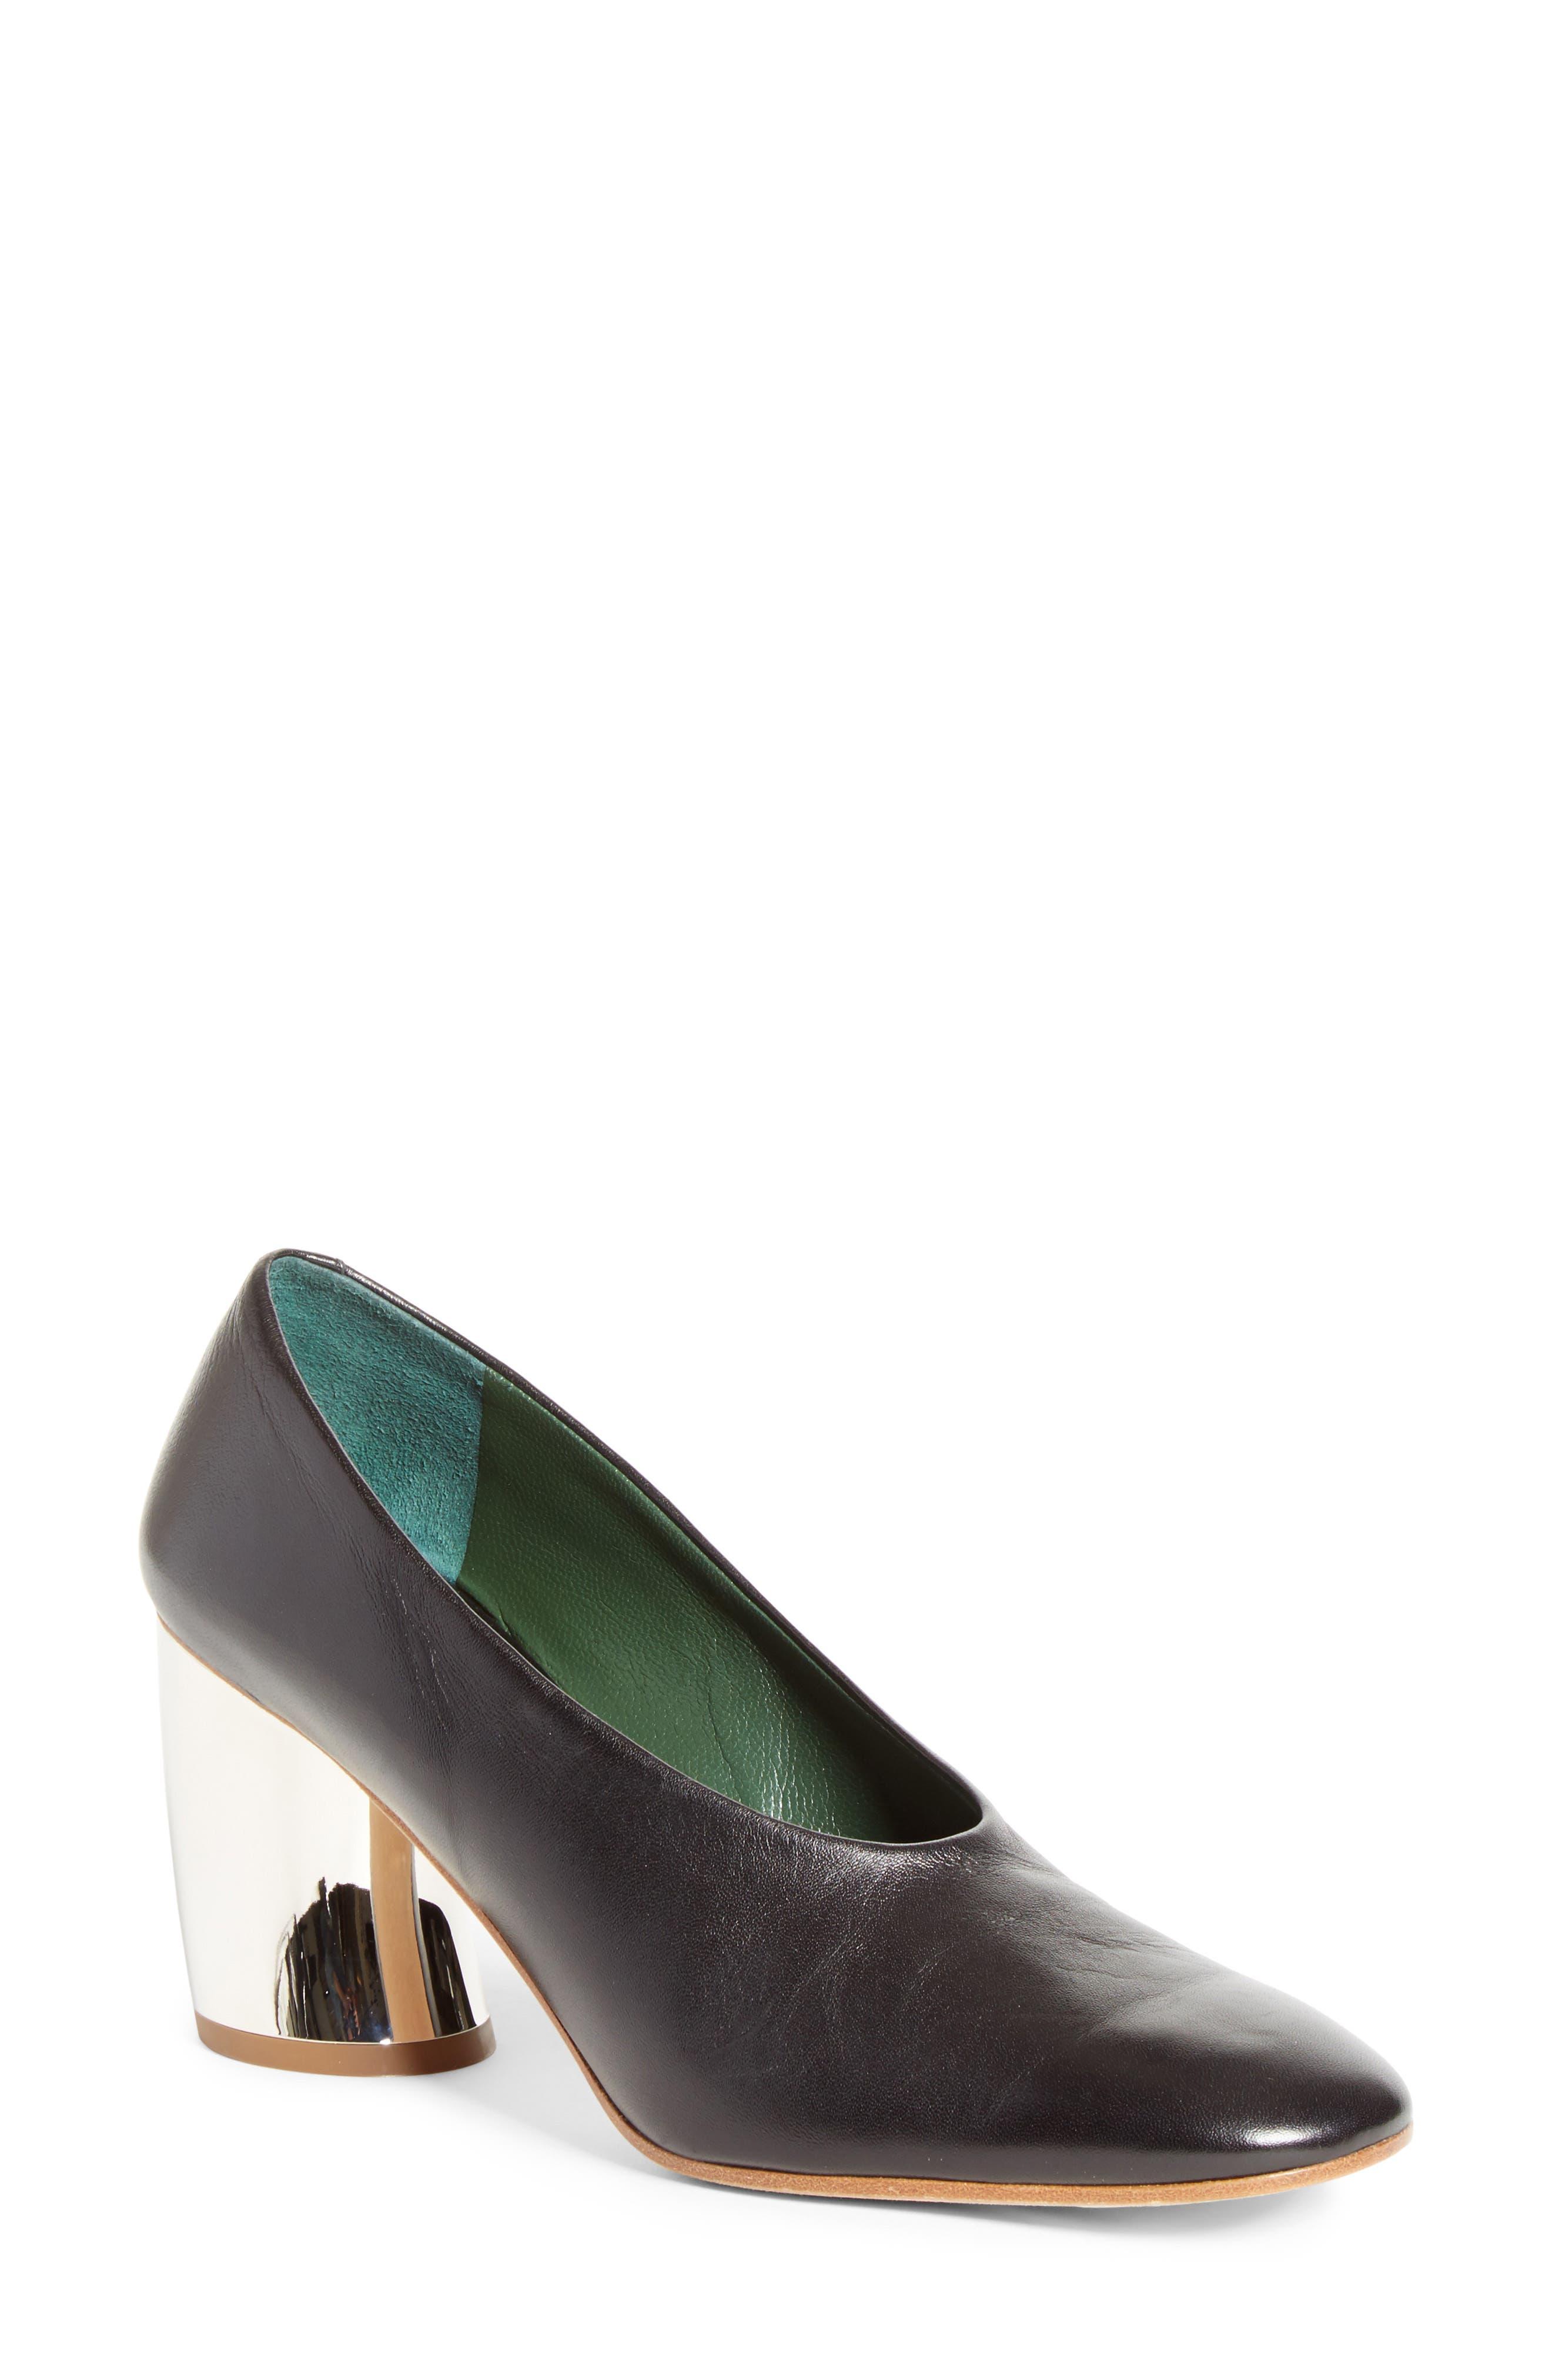 Mirrored Heel Pump,                             Main thumbnail 1, color,                             001